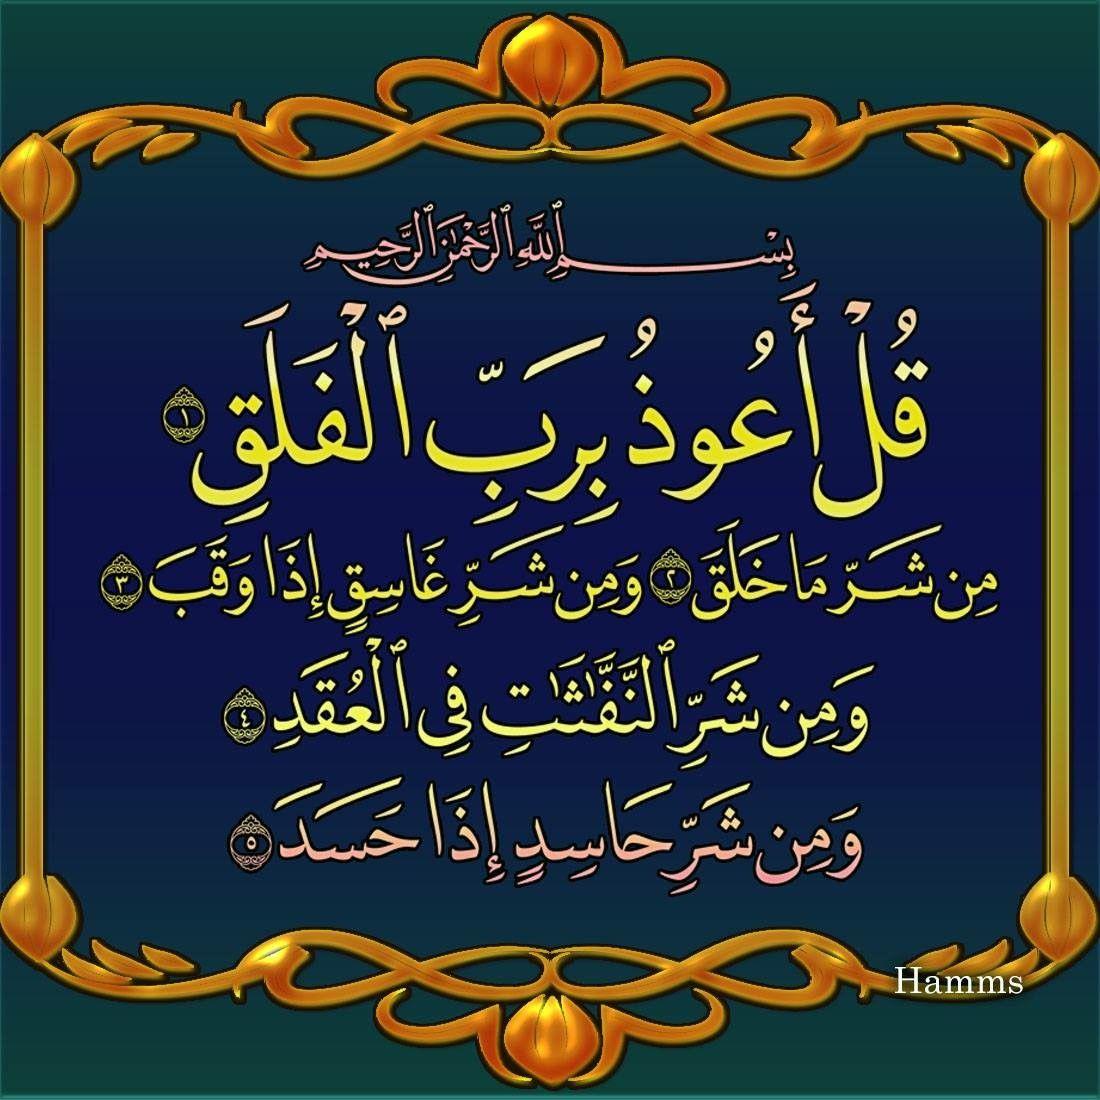 سورة الفلق Quran Verses Islamic Calligraphy Arabic Calligraphy